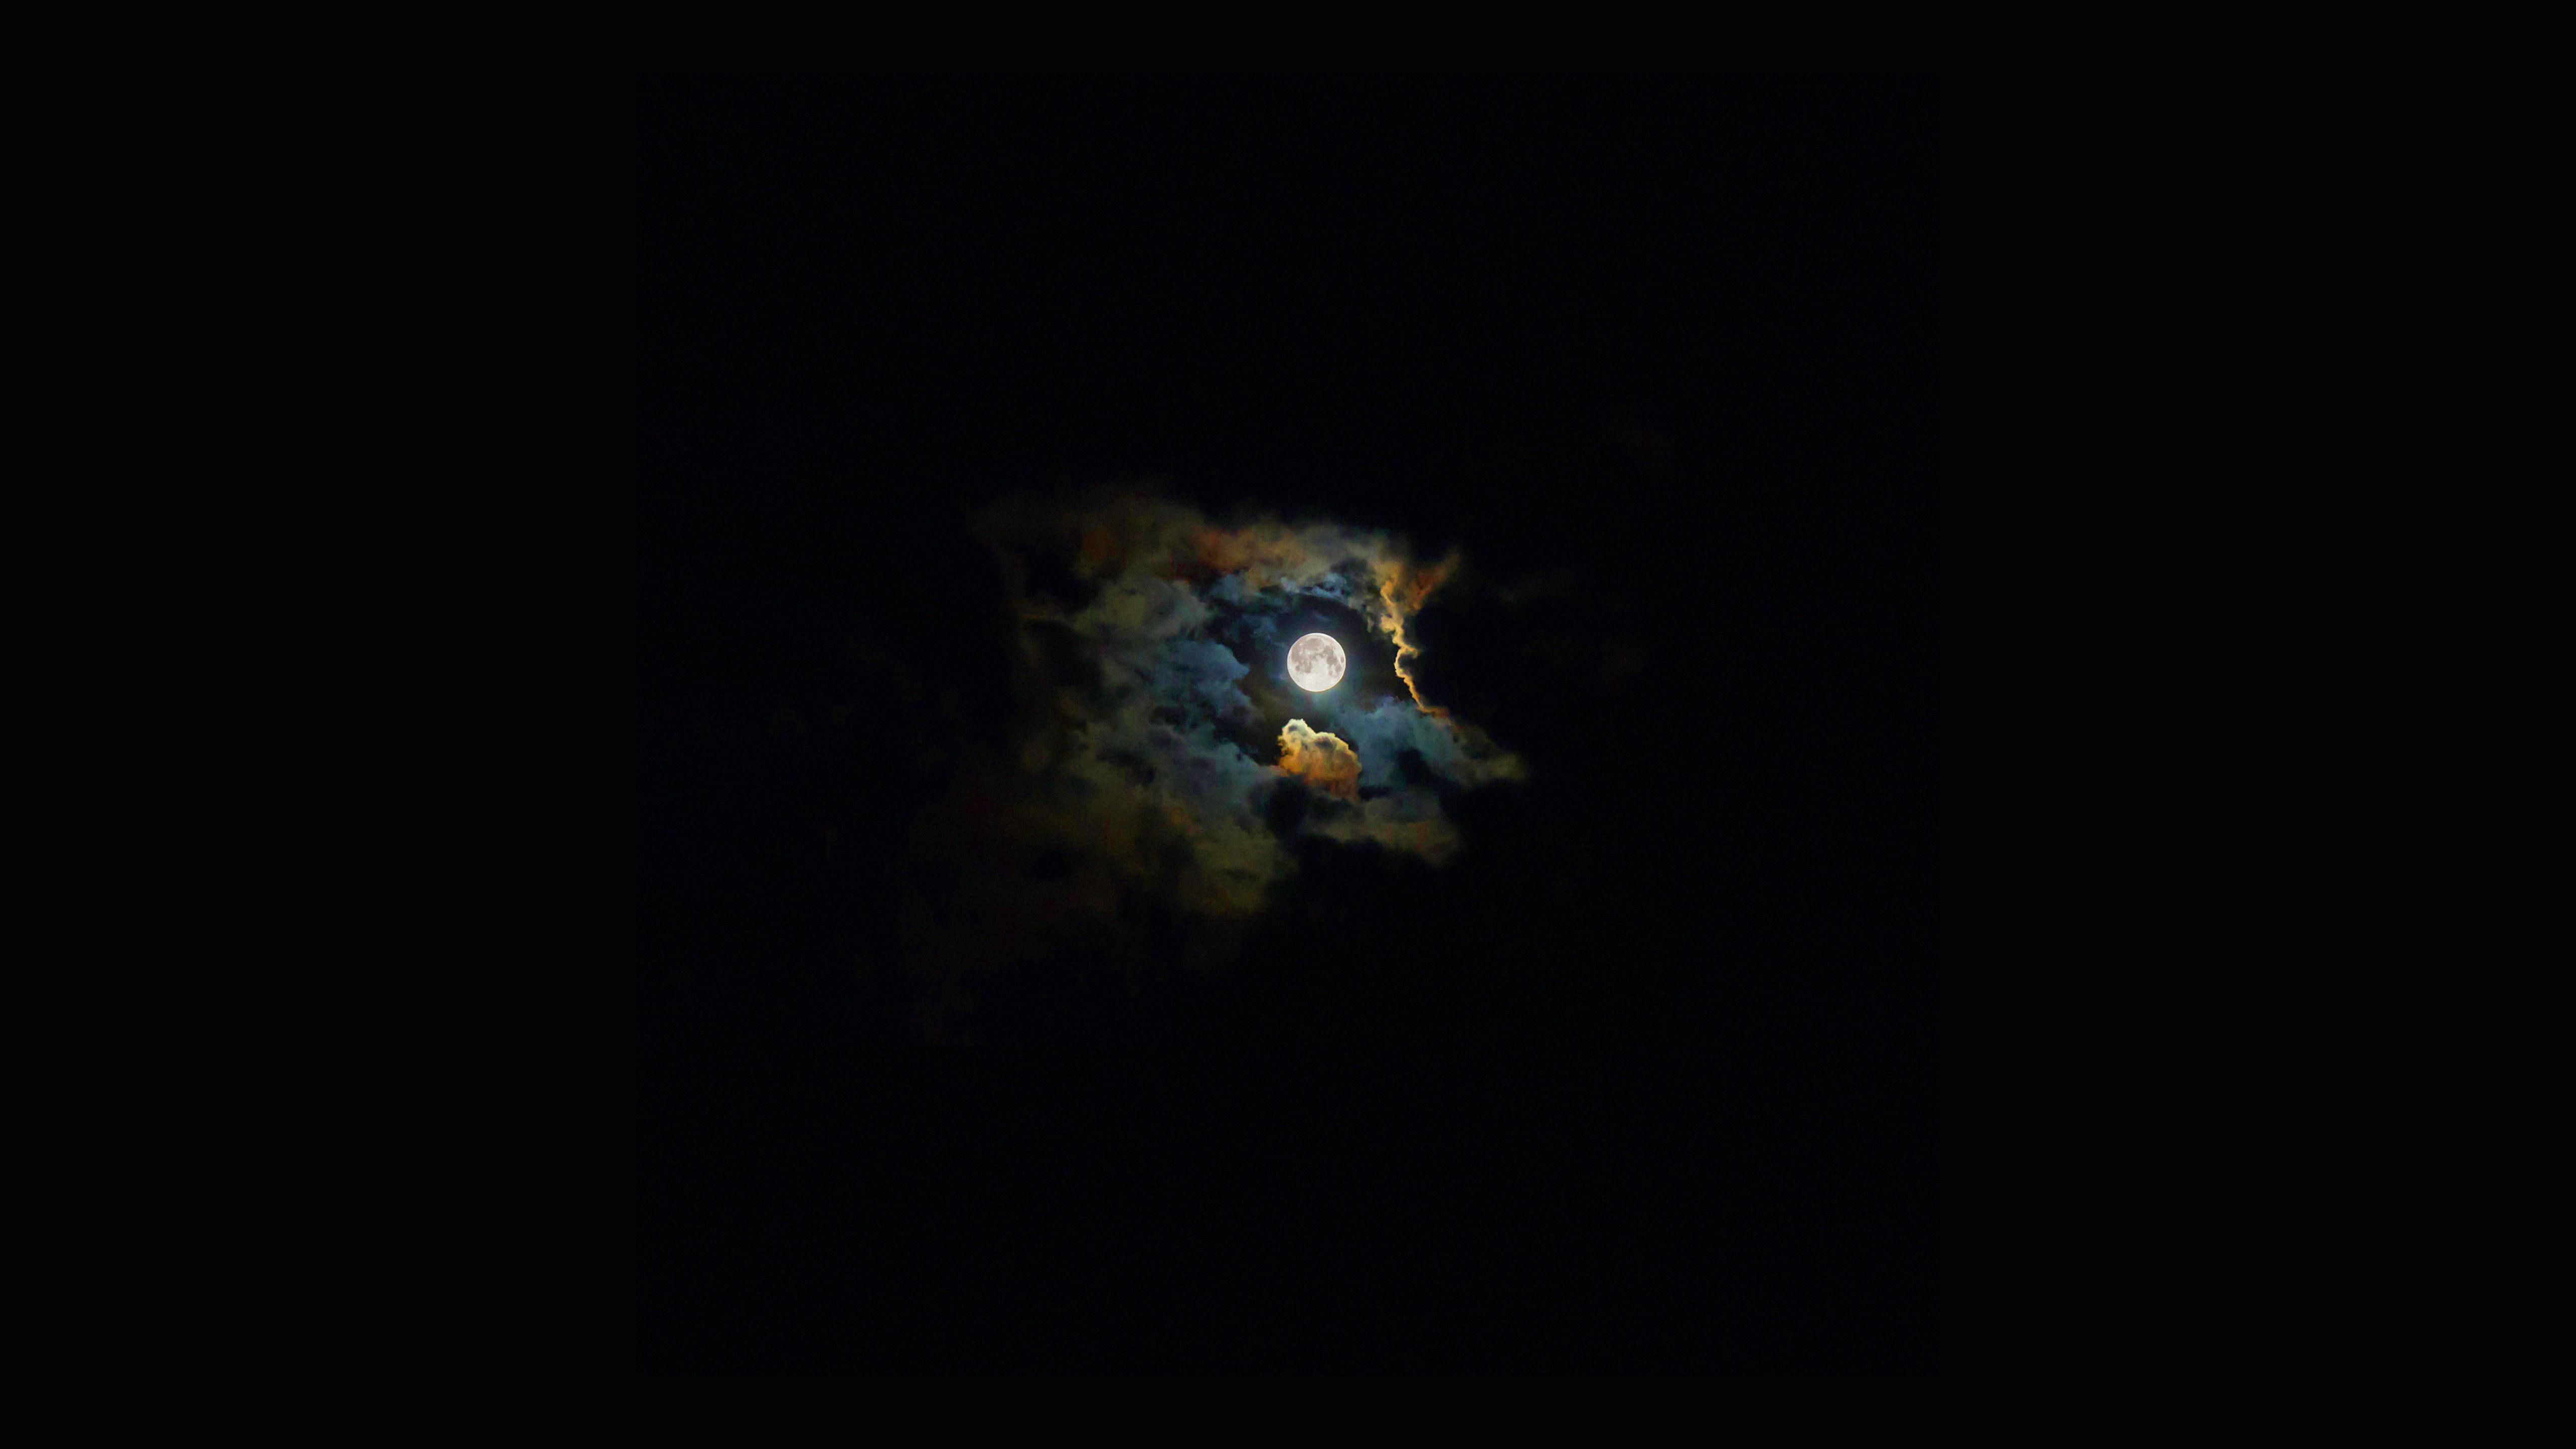 風景夜空月黒 Wallpaper Sc Desktop